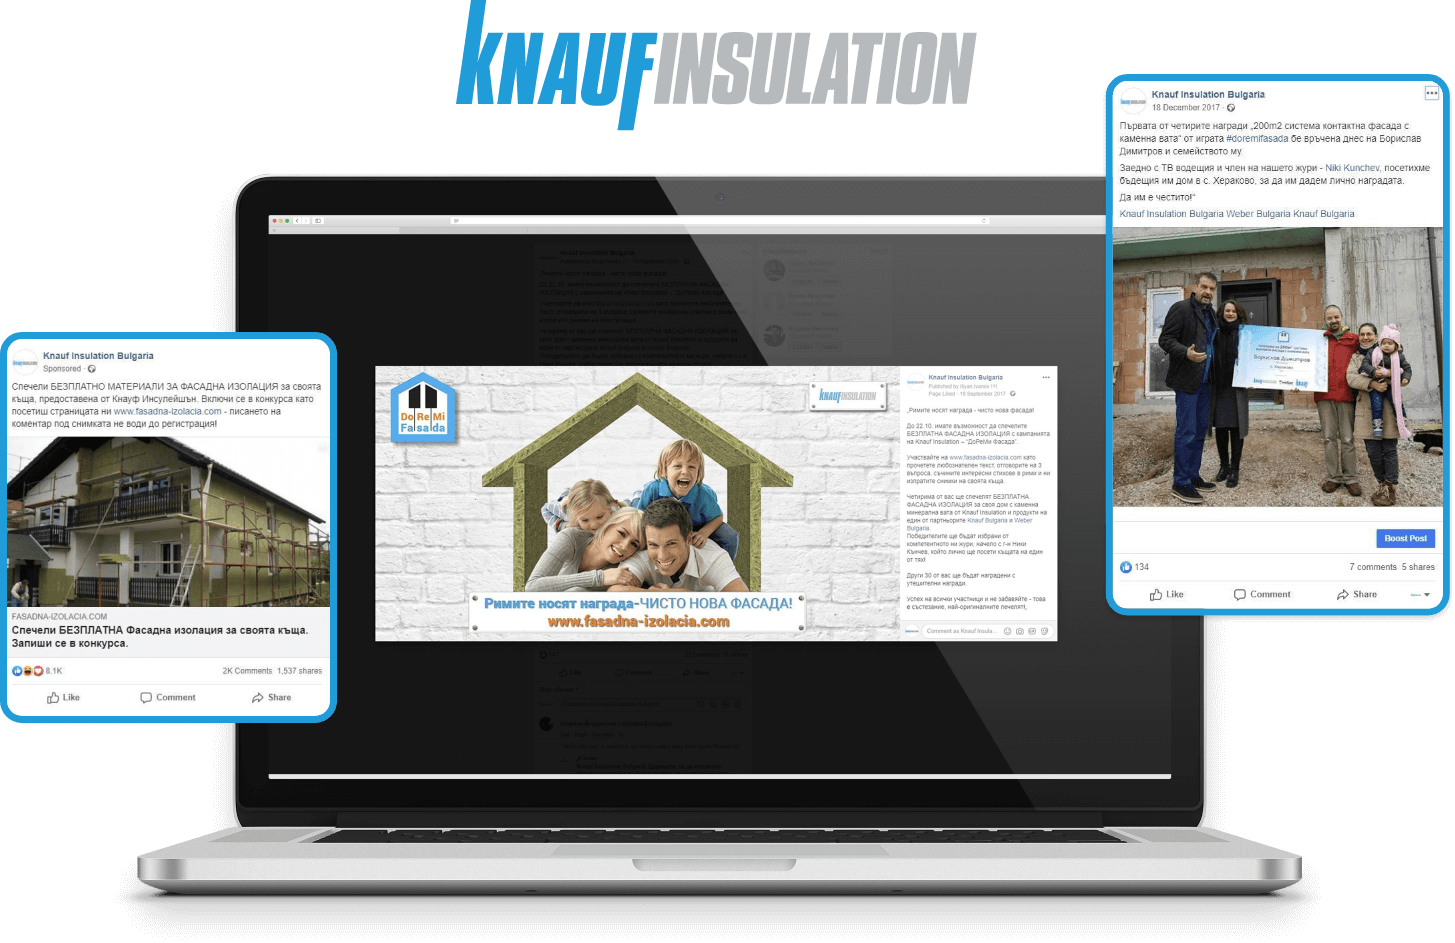 Knauf Insulation Campaign